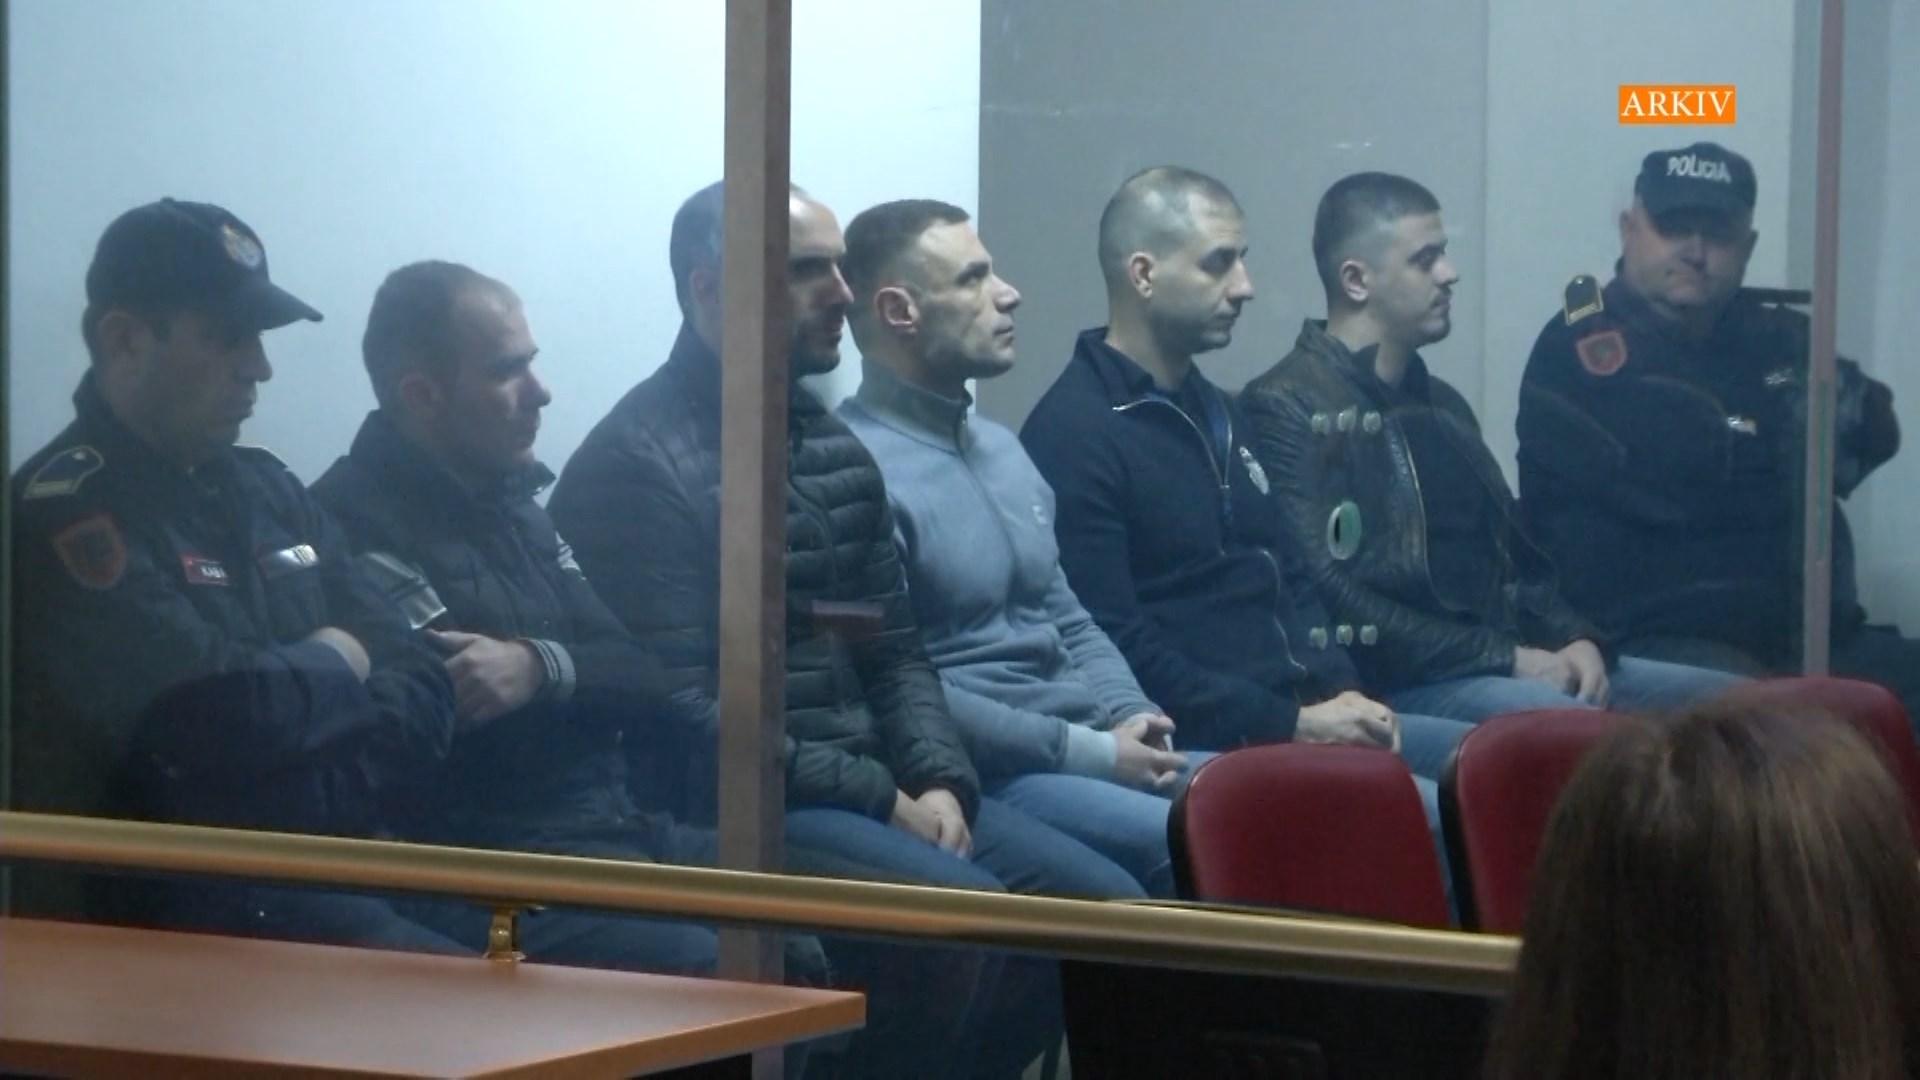 Shullazi, gjykata refuzon kërkesën e Gilmando Danit